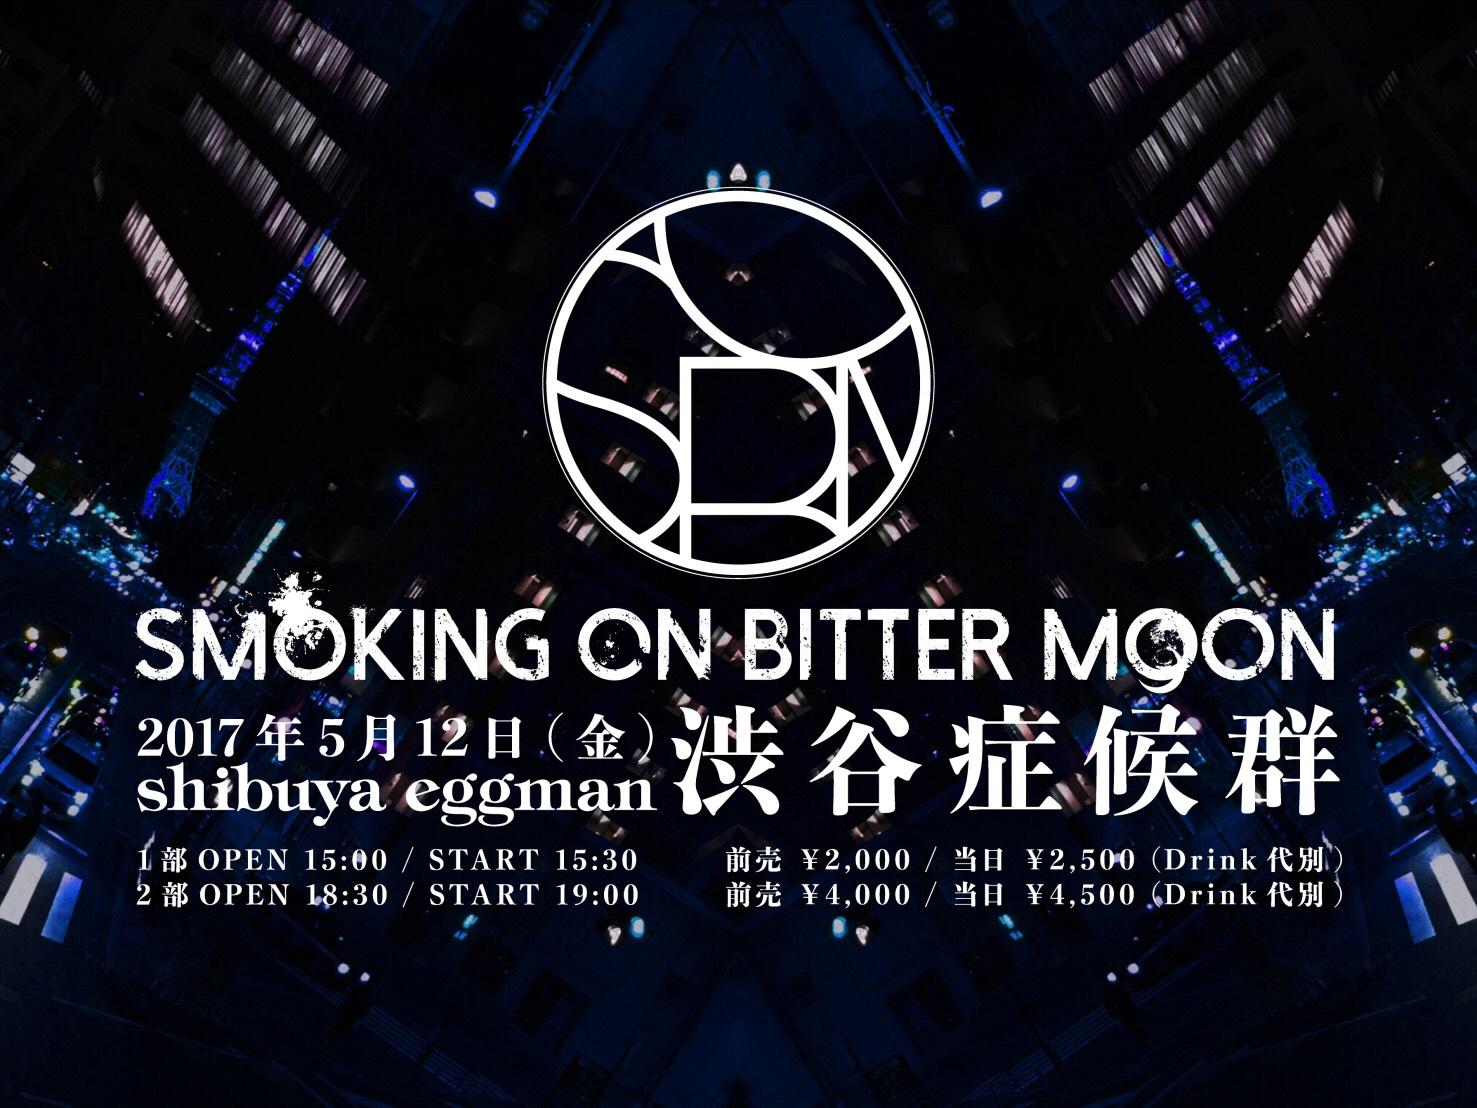 SMOKING ON BITTER MOON「渋谷症候群」